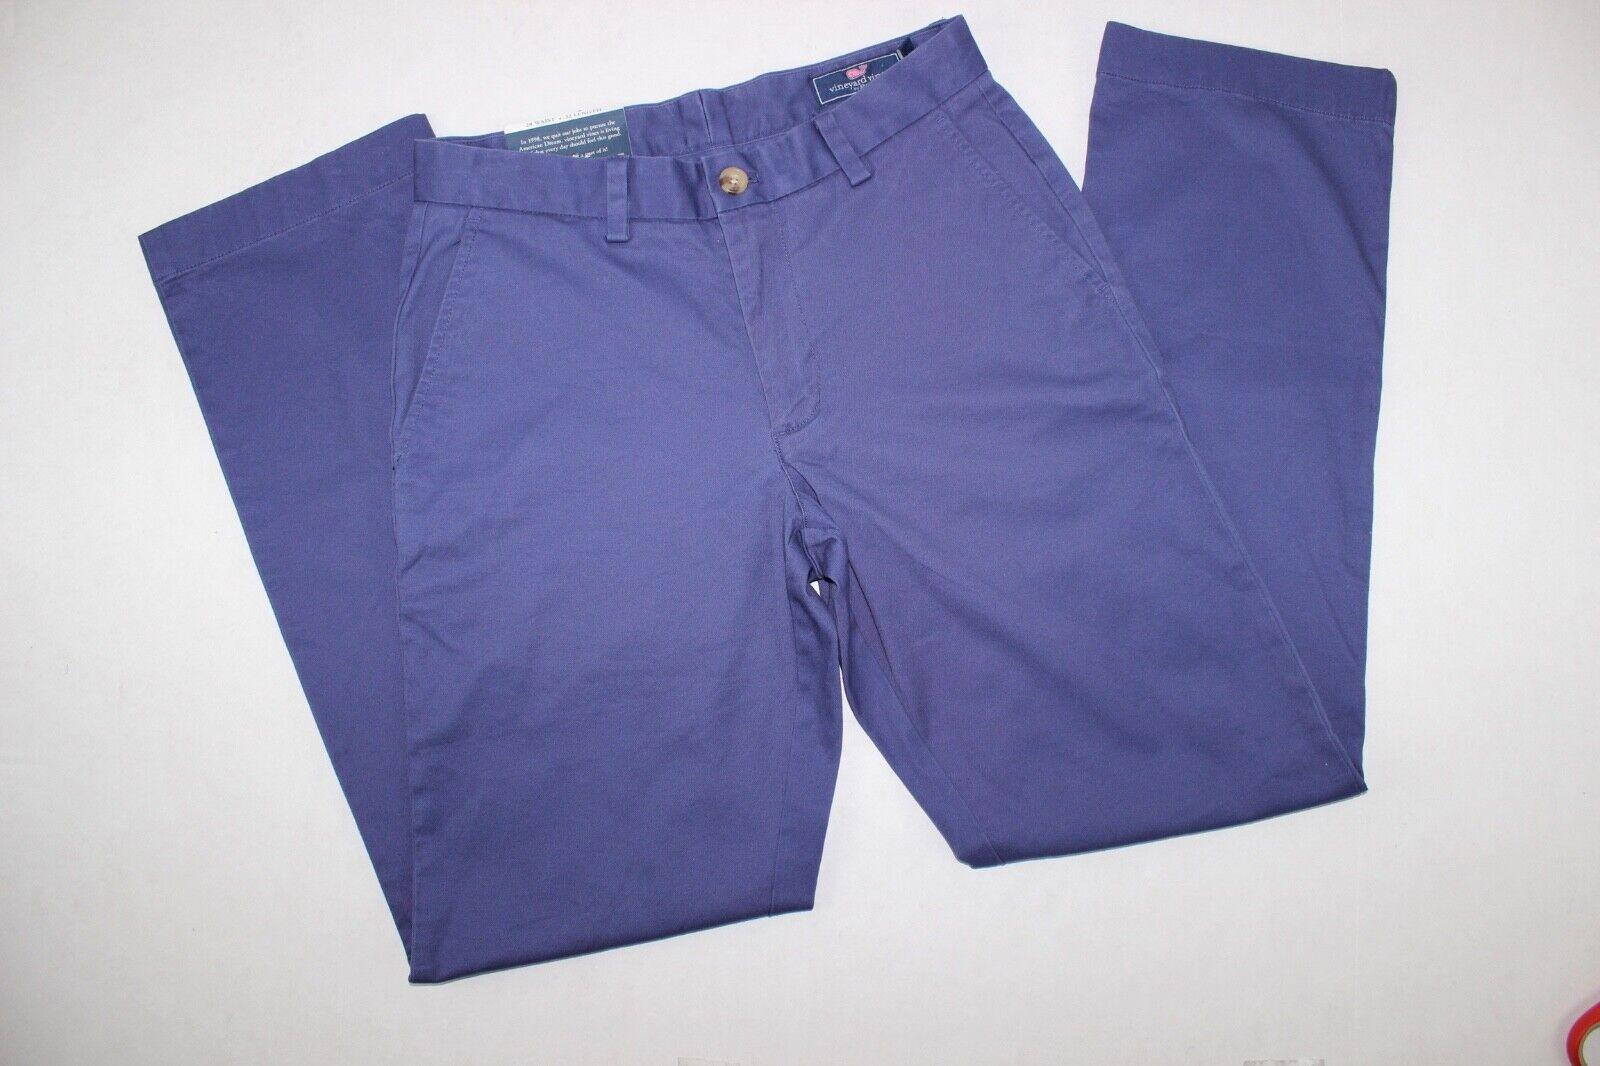 Vineyard Vines Breaker Navy Pants SZ 28 x 32 NWT